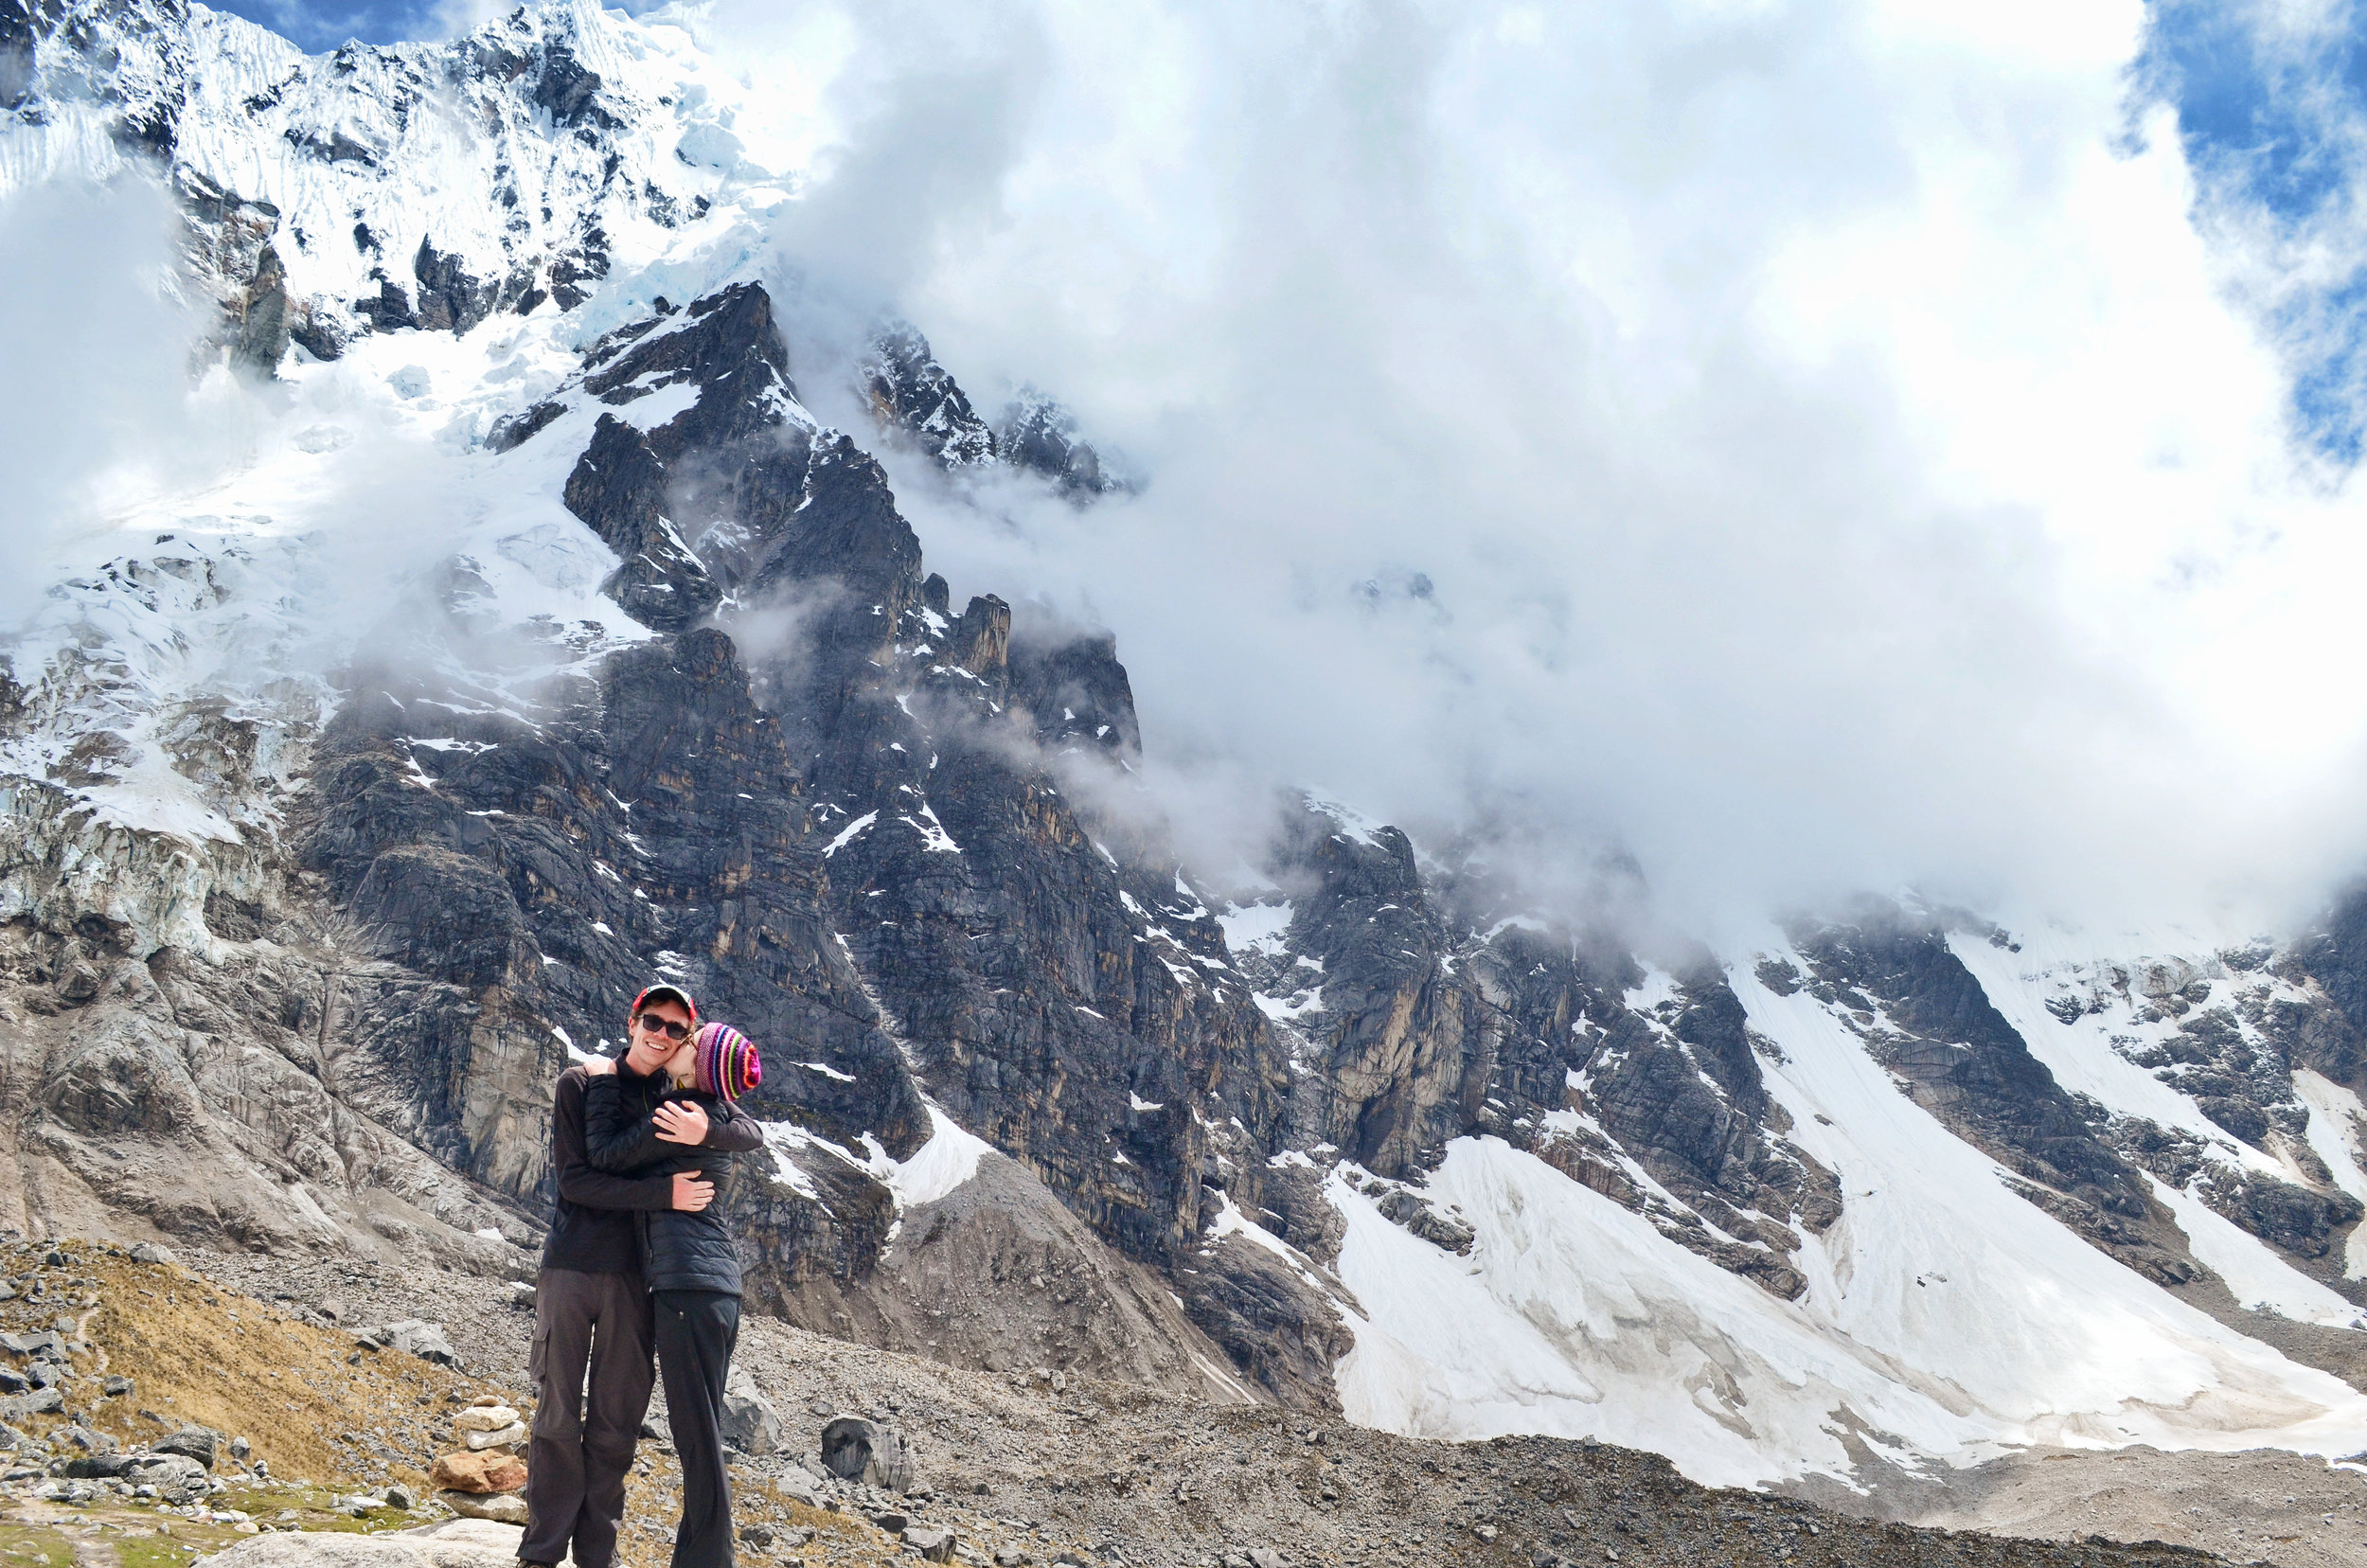 At Salkantay Pass, the highest point on the trek